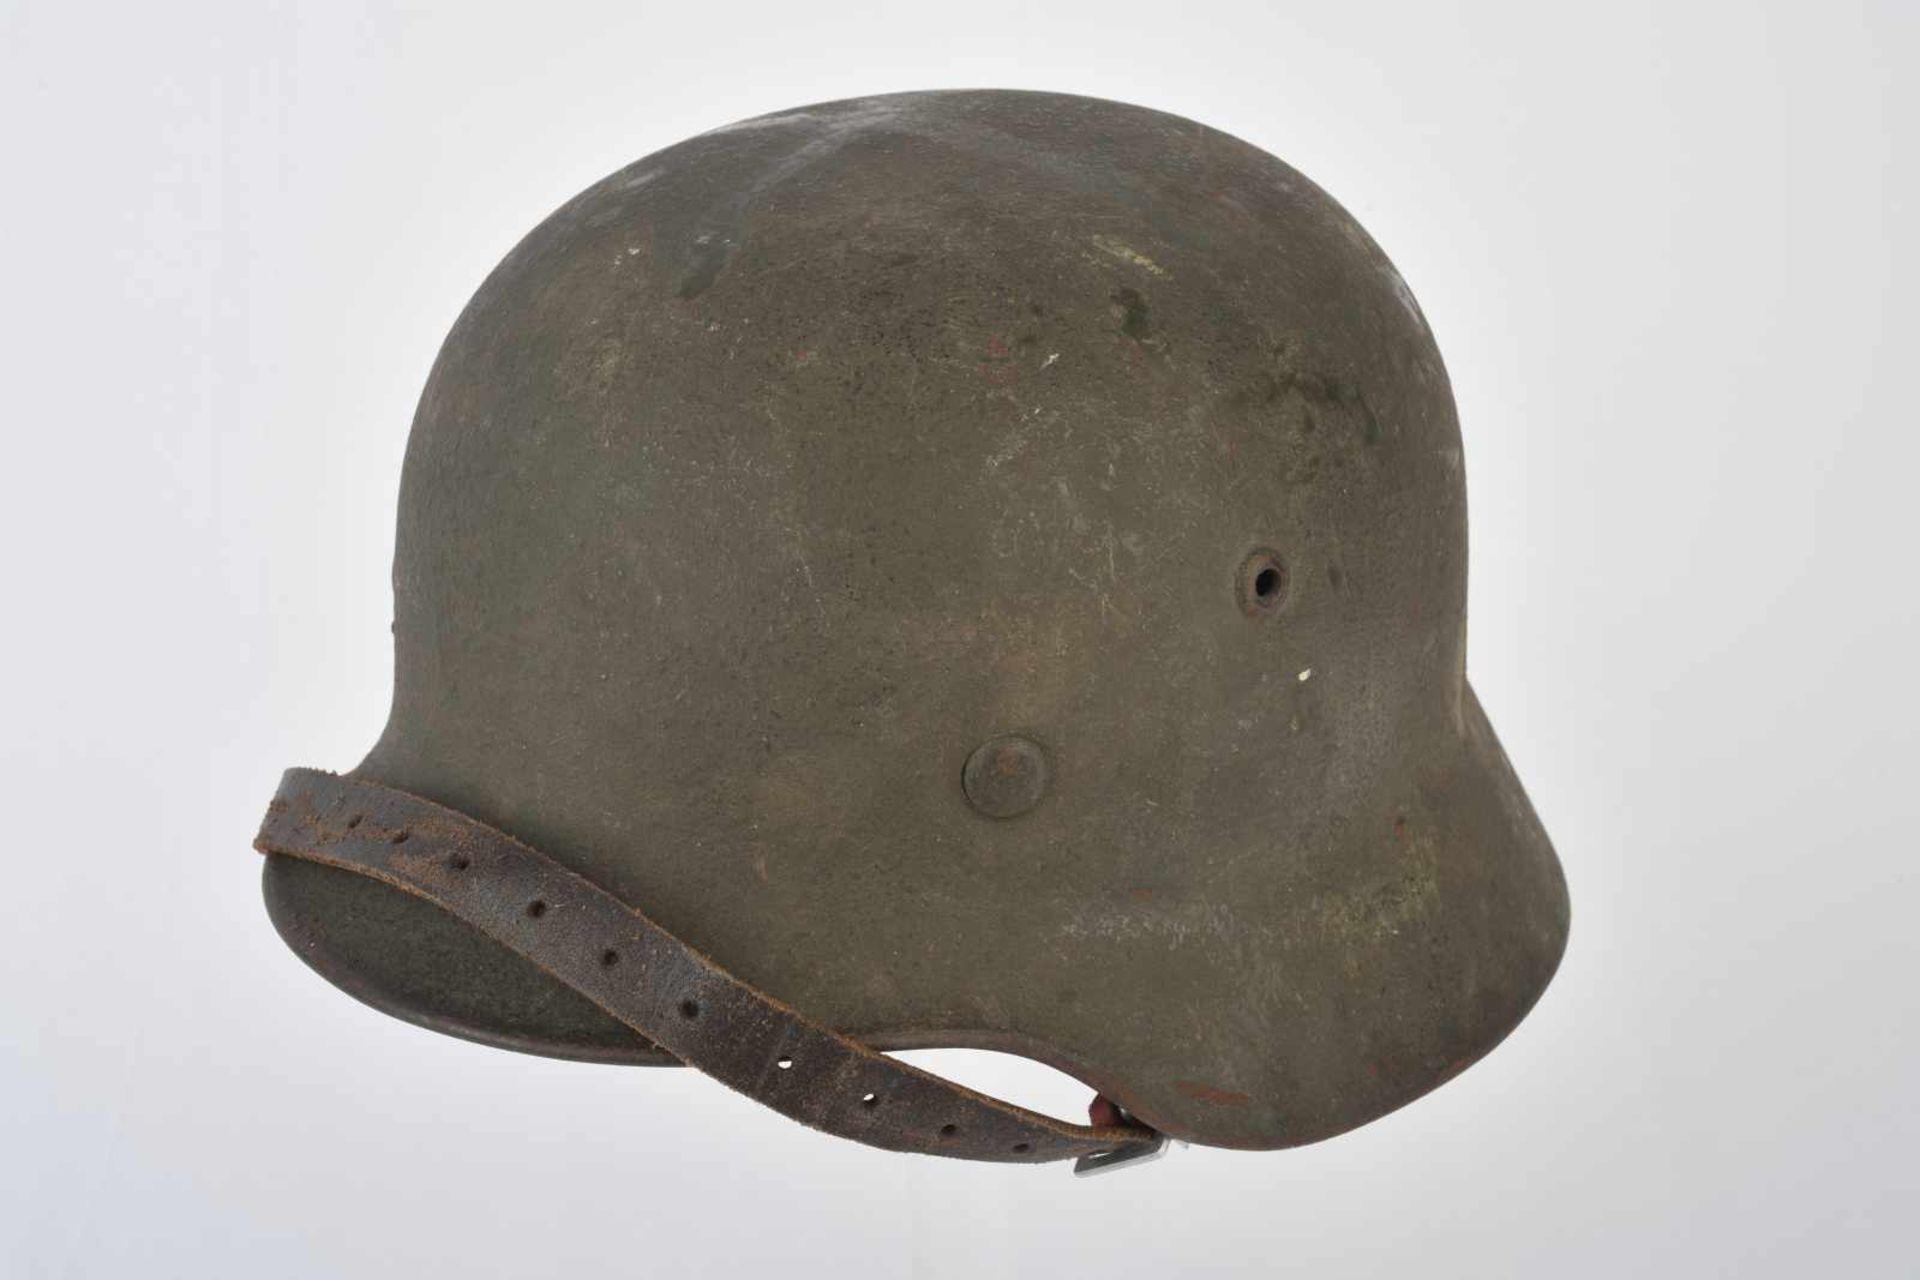 Casque nominatif de la Heer. Coque de casque 40, fabrication «Q62», numéro de lot illisible.